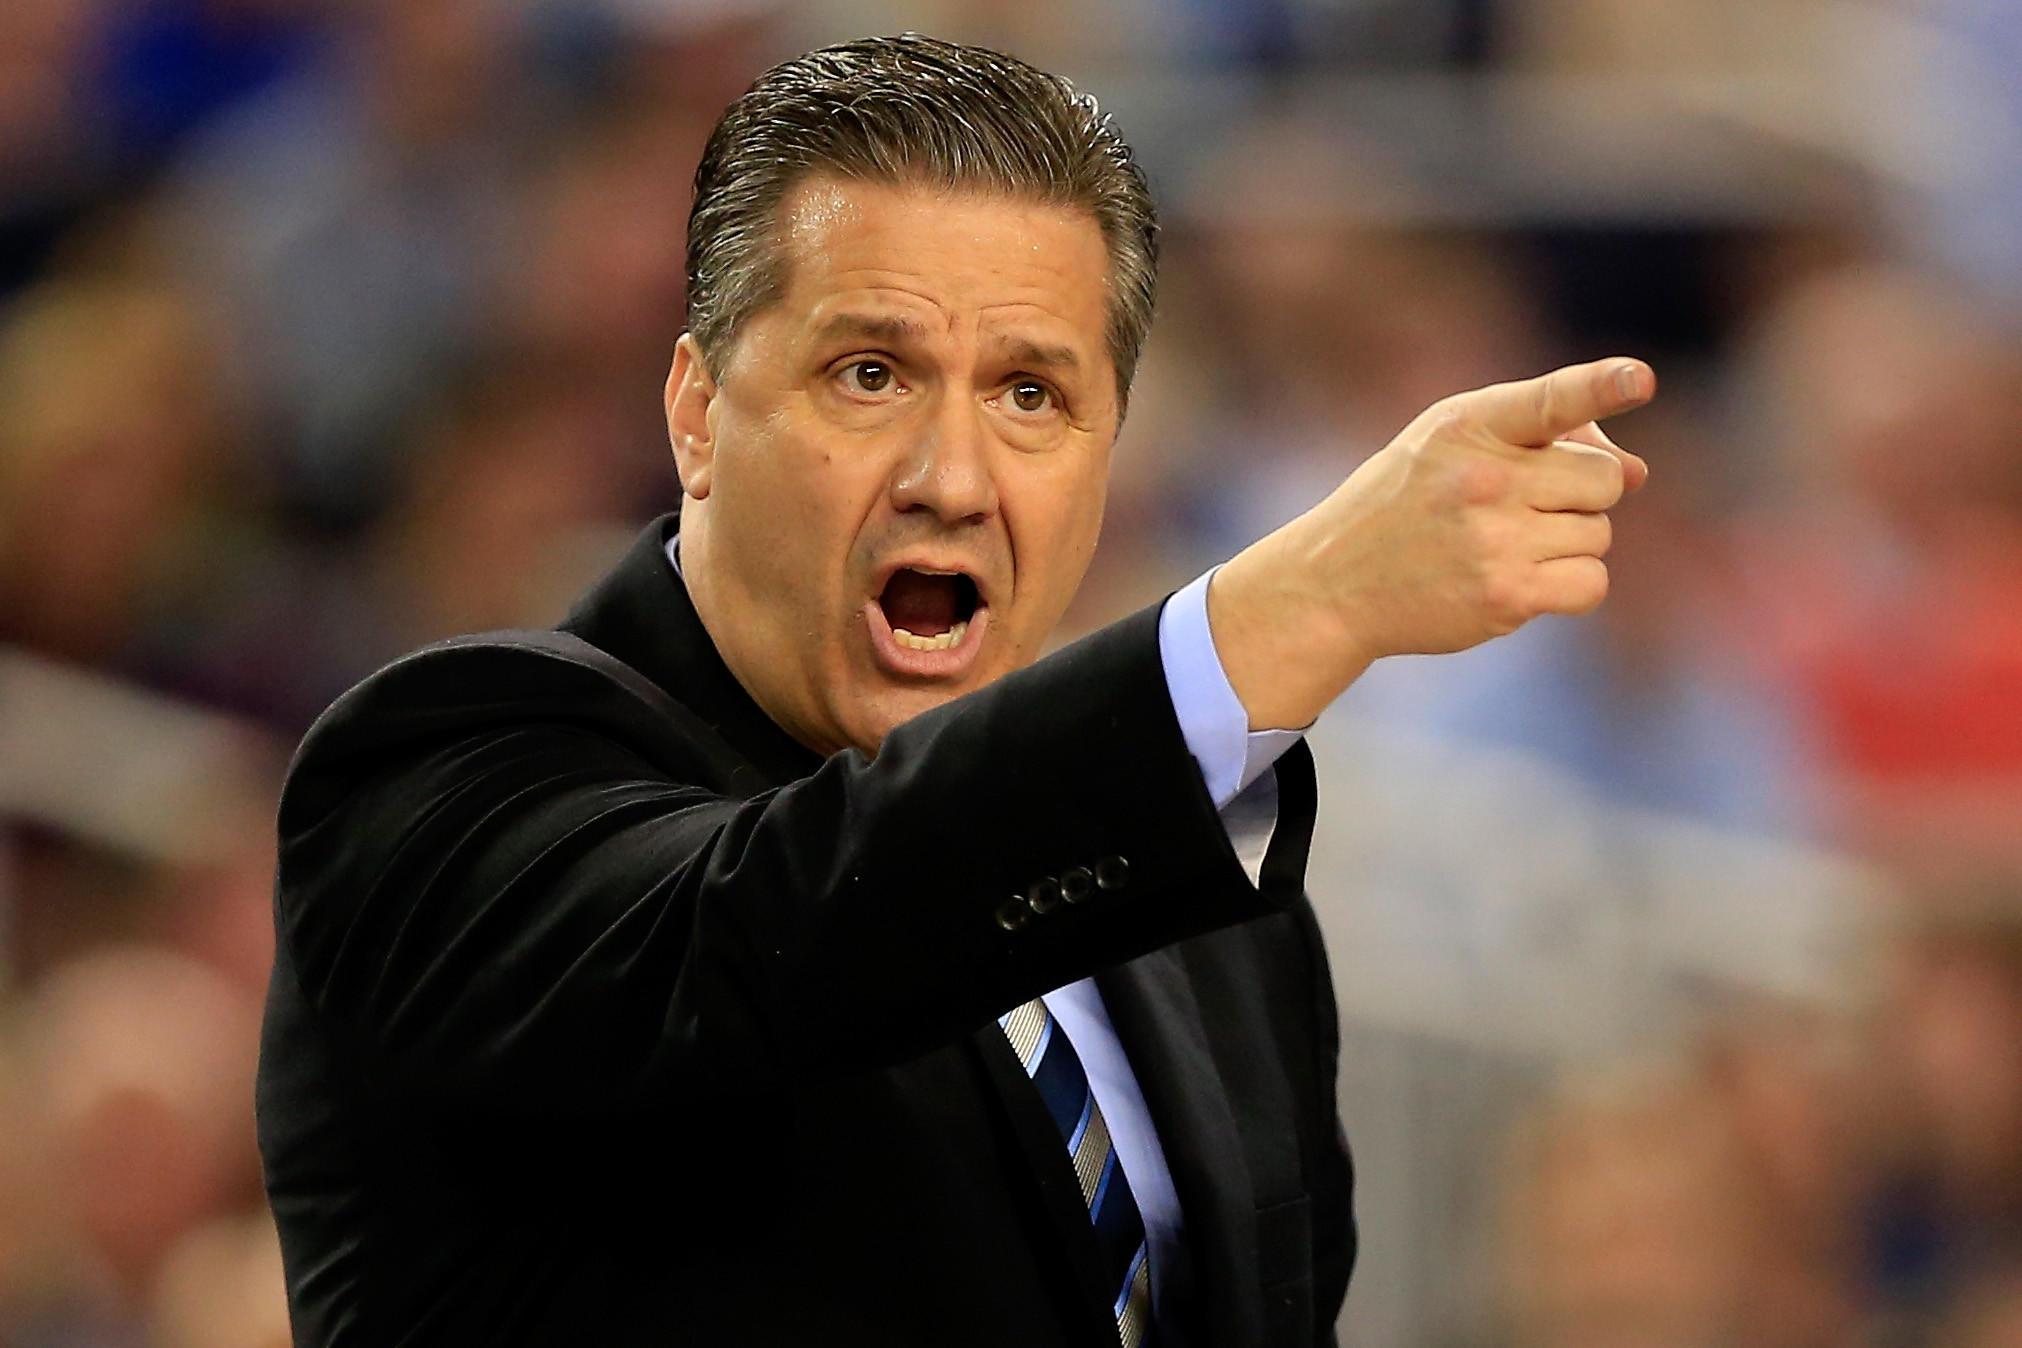 Kentucky head coach John Calipari has signed a 7-year contract worth more than $52 million June 5, 2014.